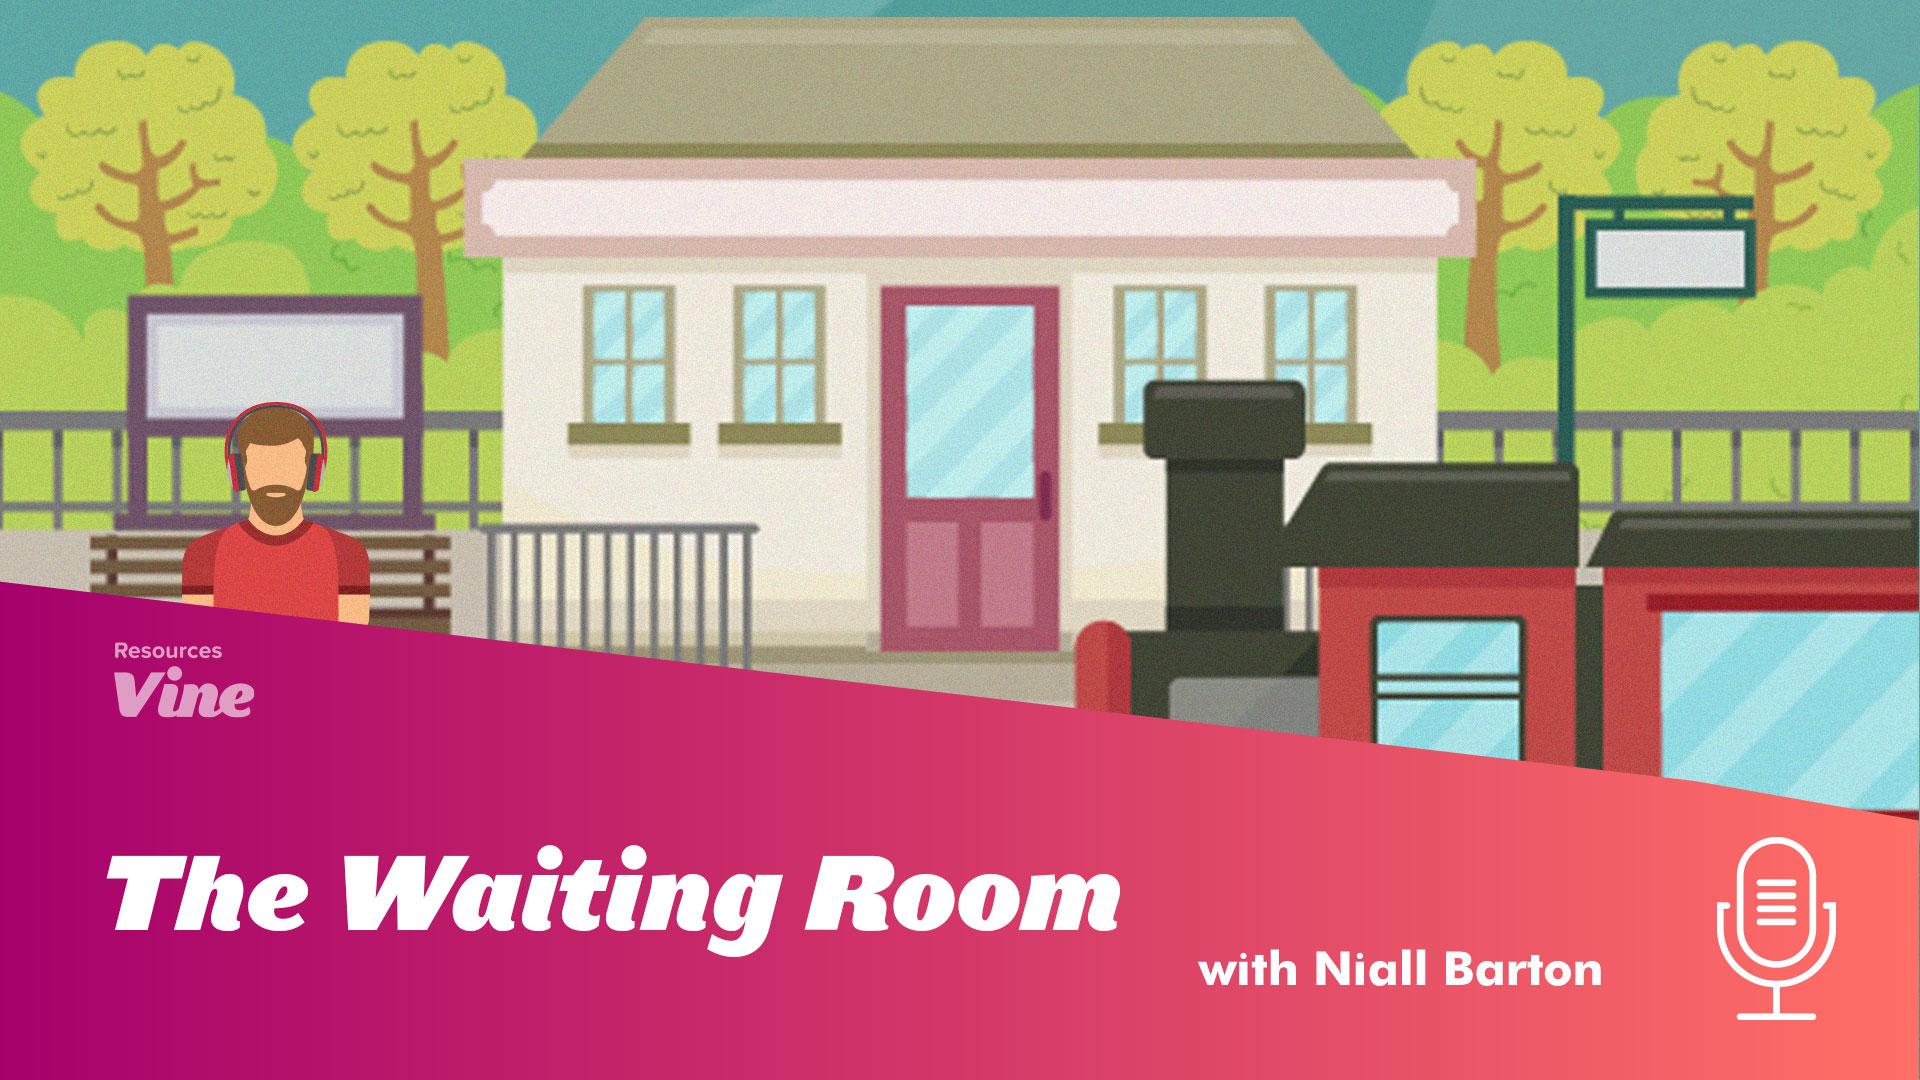 Thumbnail_The_Waiting_Room_NB